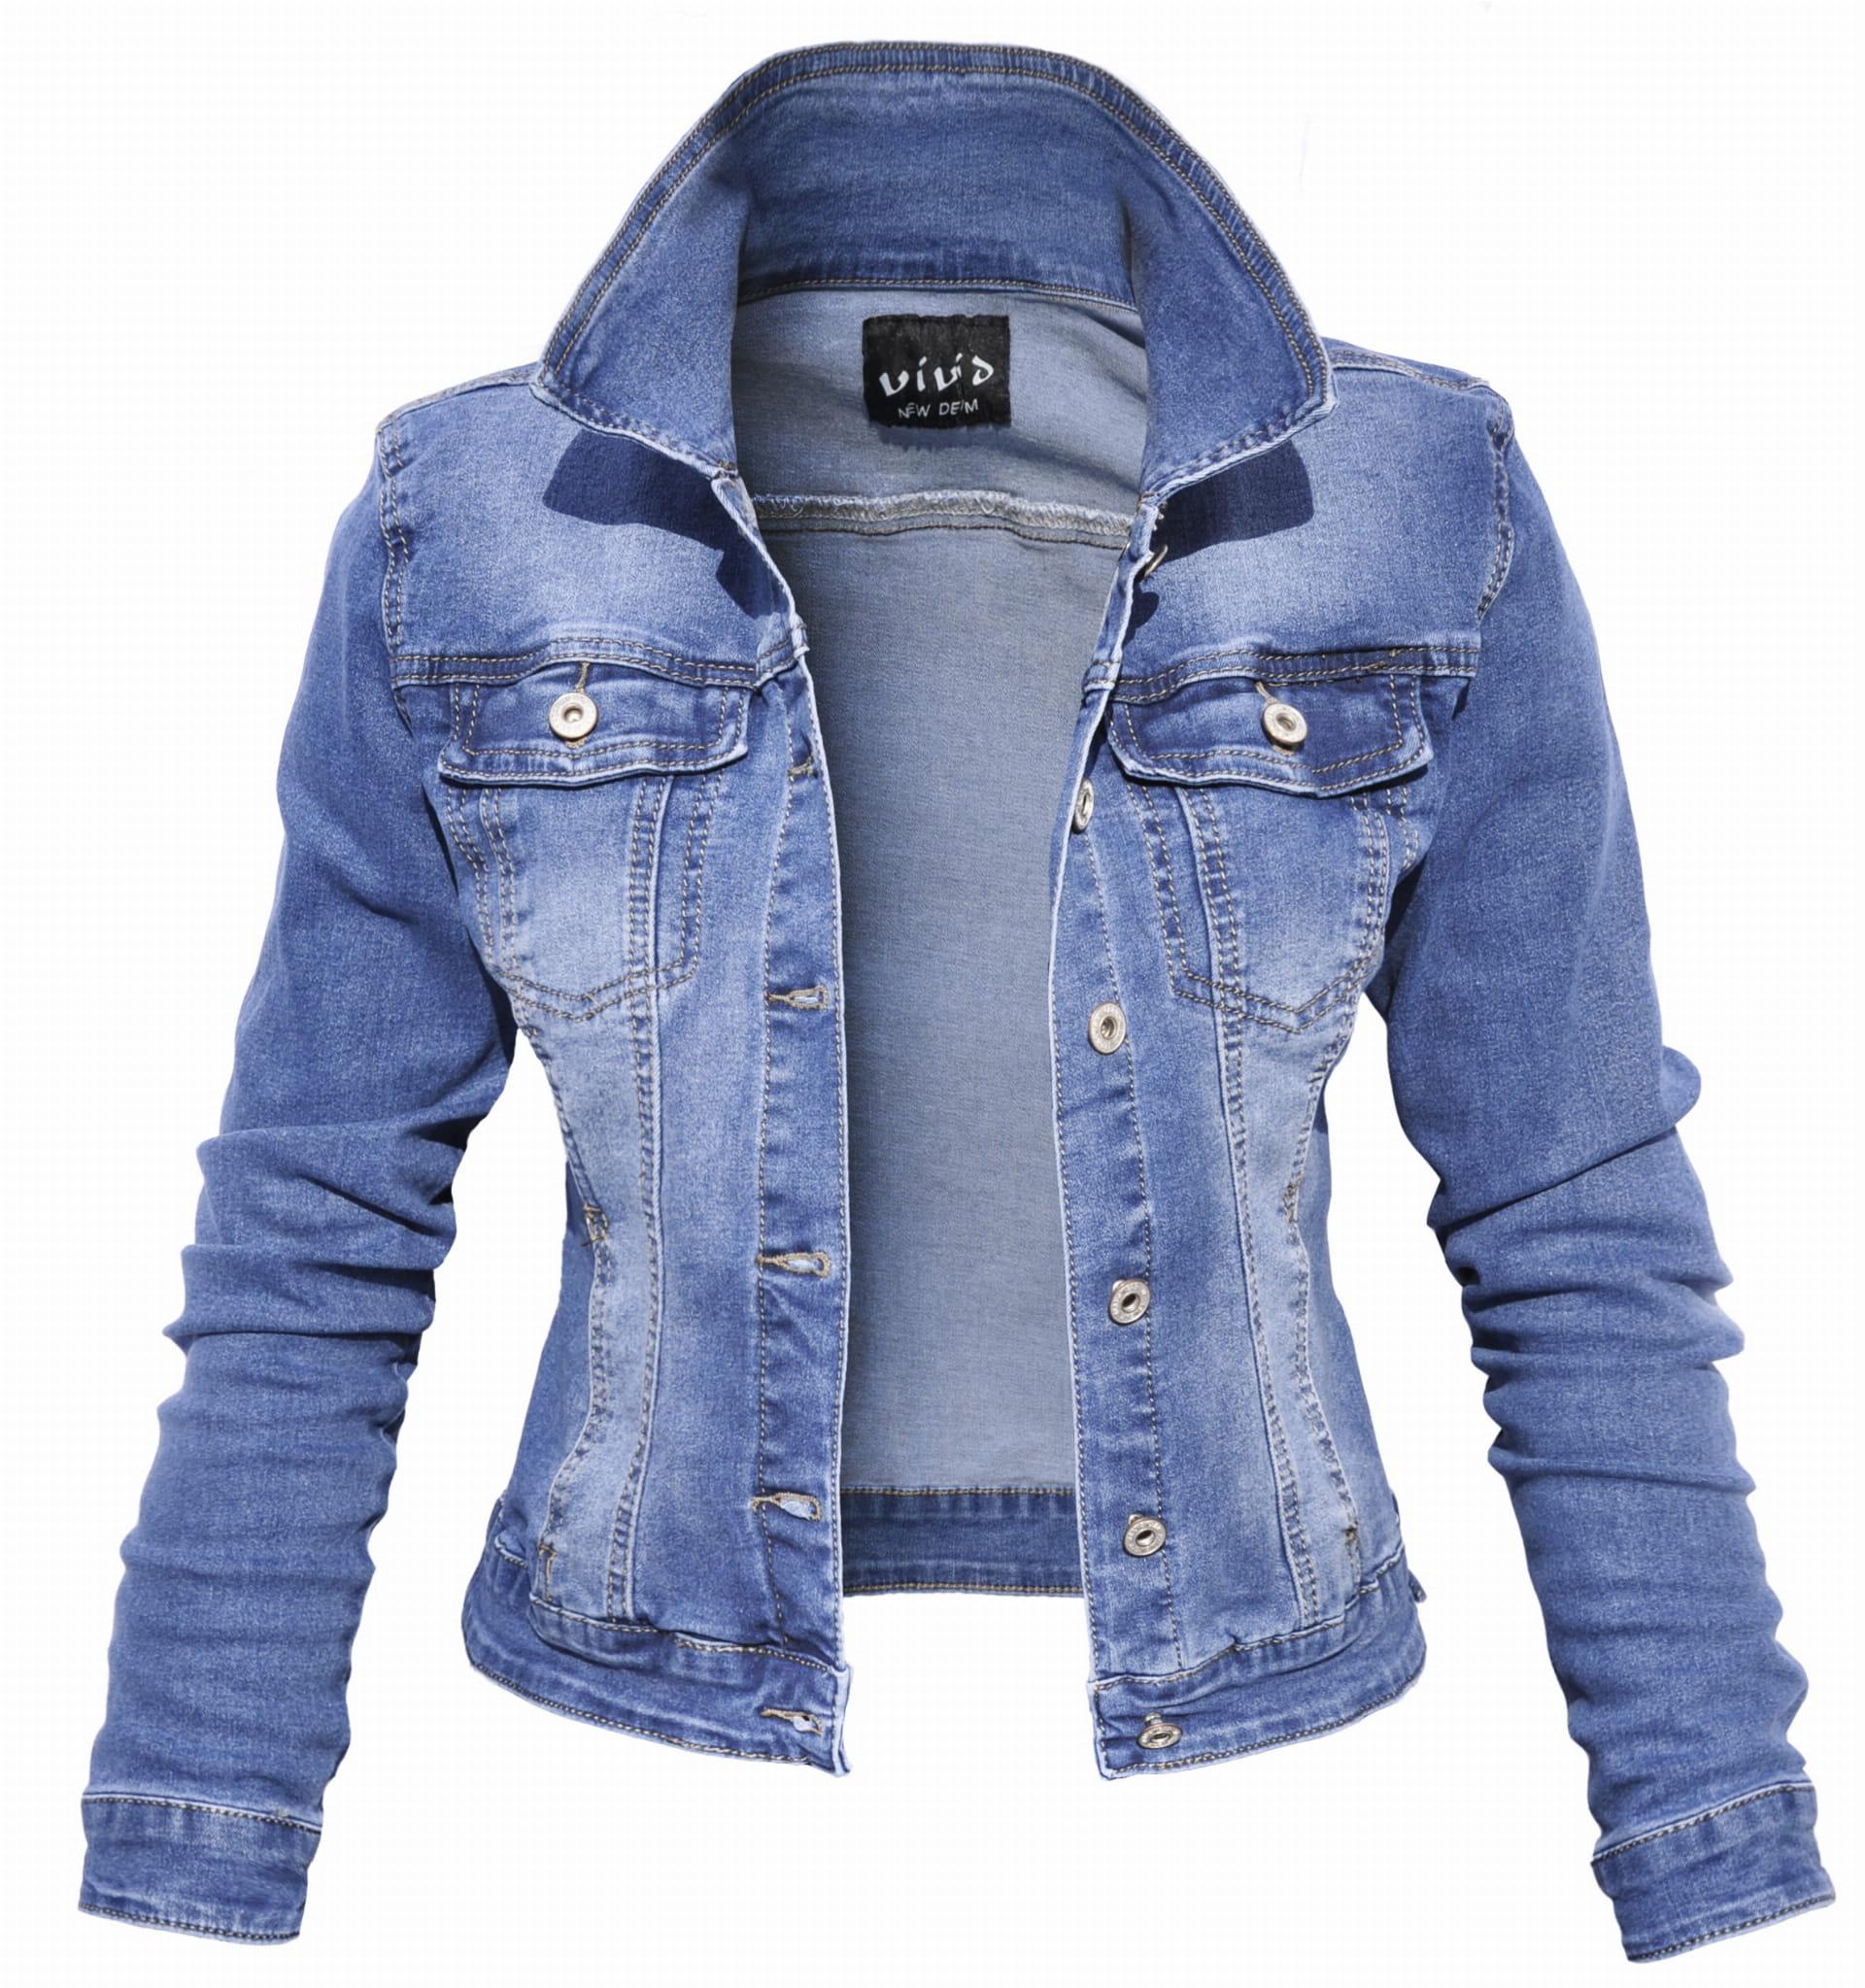 a9d4ccbb42f2f Modna Kurtka Damska Jeans Katana Jeansowa Denim Wiosna Lato Jesień 2019  model #143 sklep FASHIONAVENUE ...